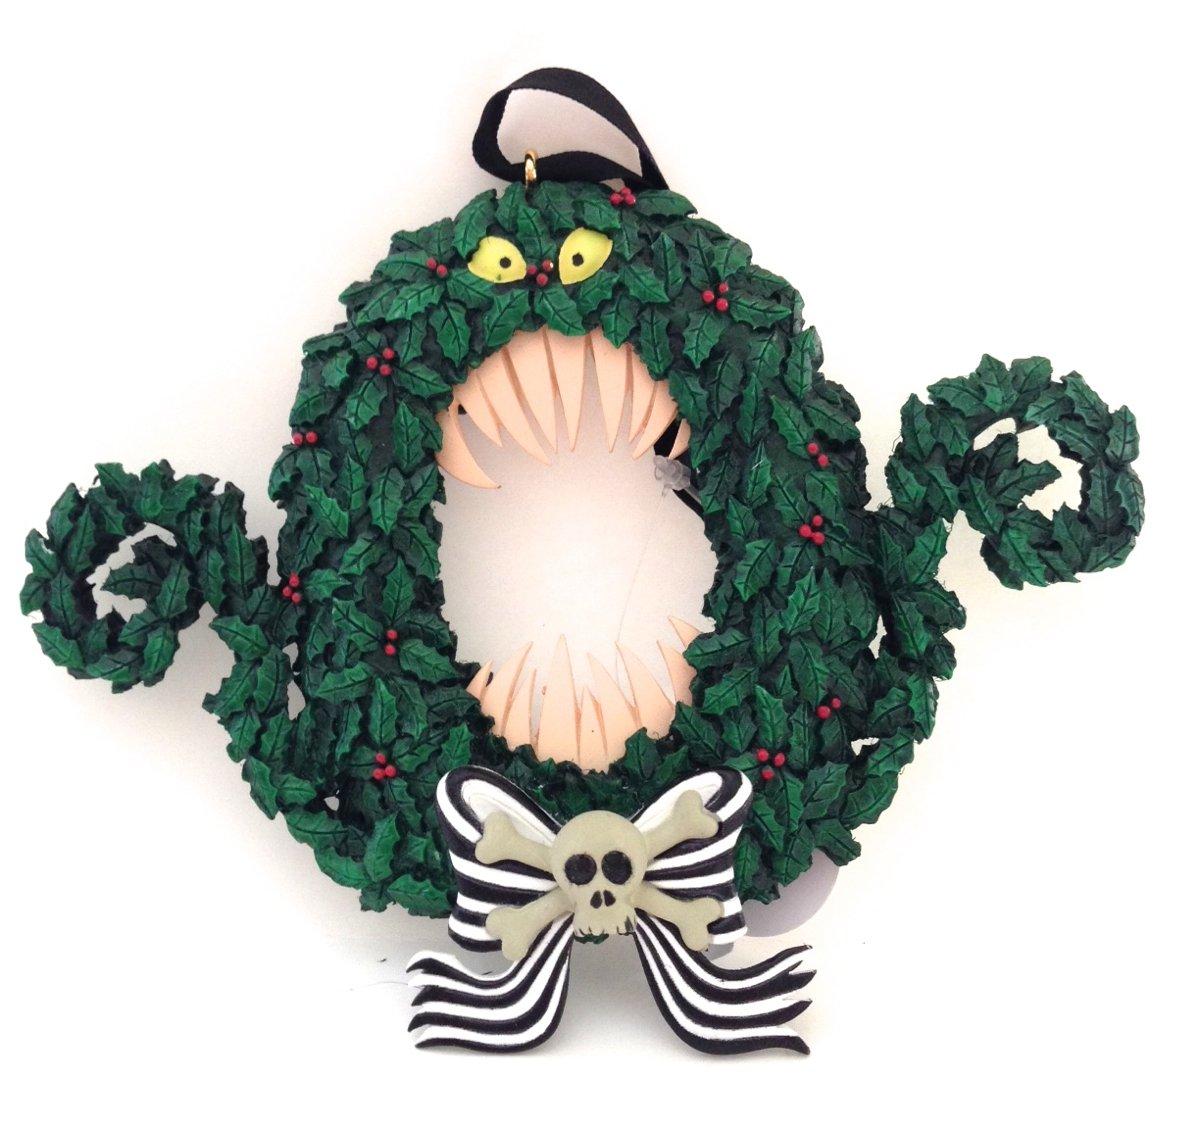 Nightmare Before Christmas Wreath Holiday